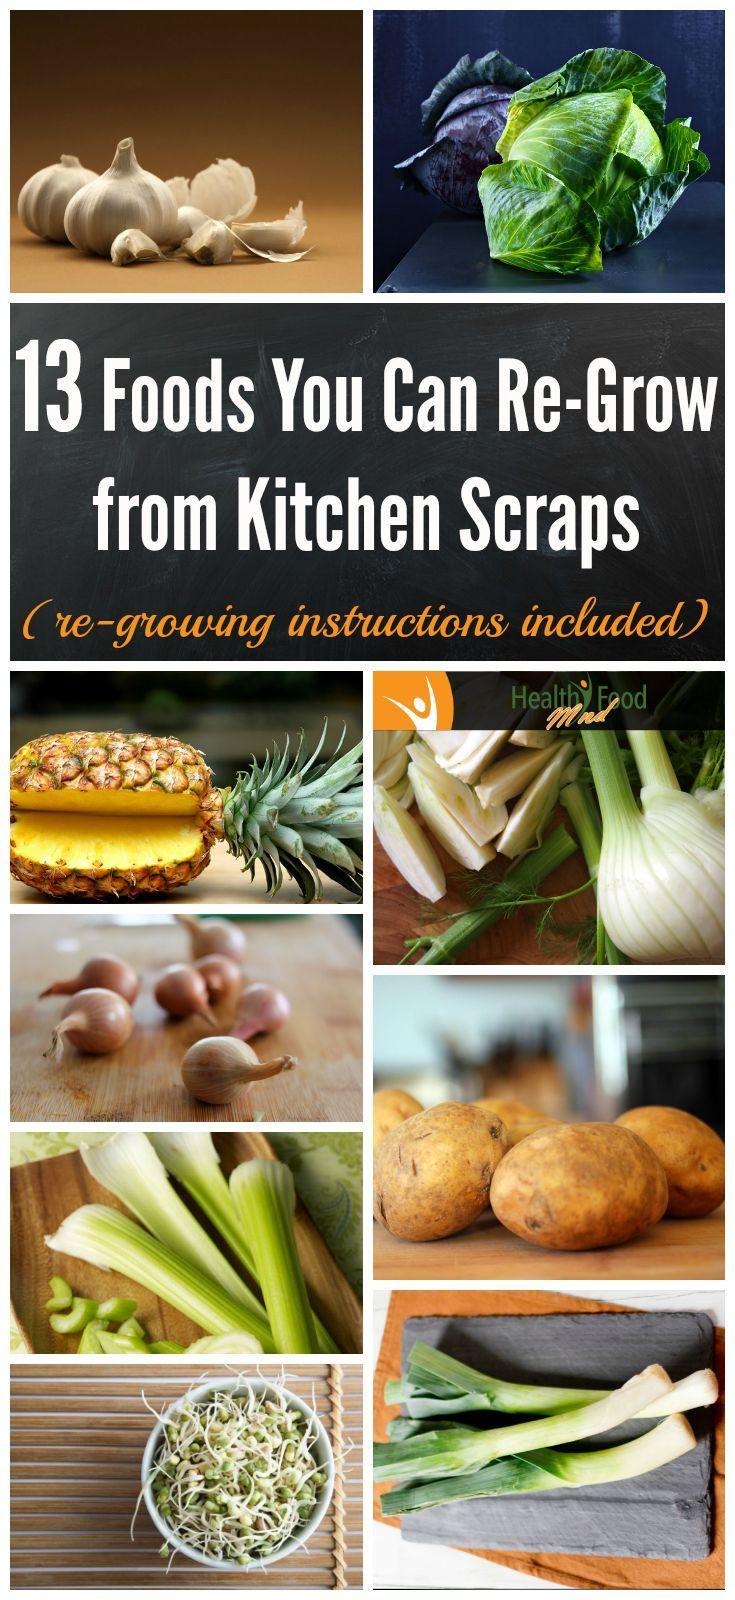 Kitchen Scrap Gardening 17 Best Images About Regrow Foods On Pinterest Gardens